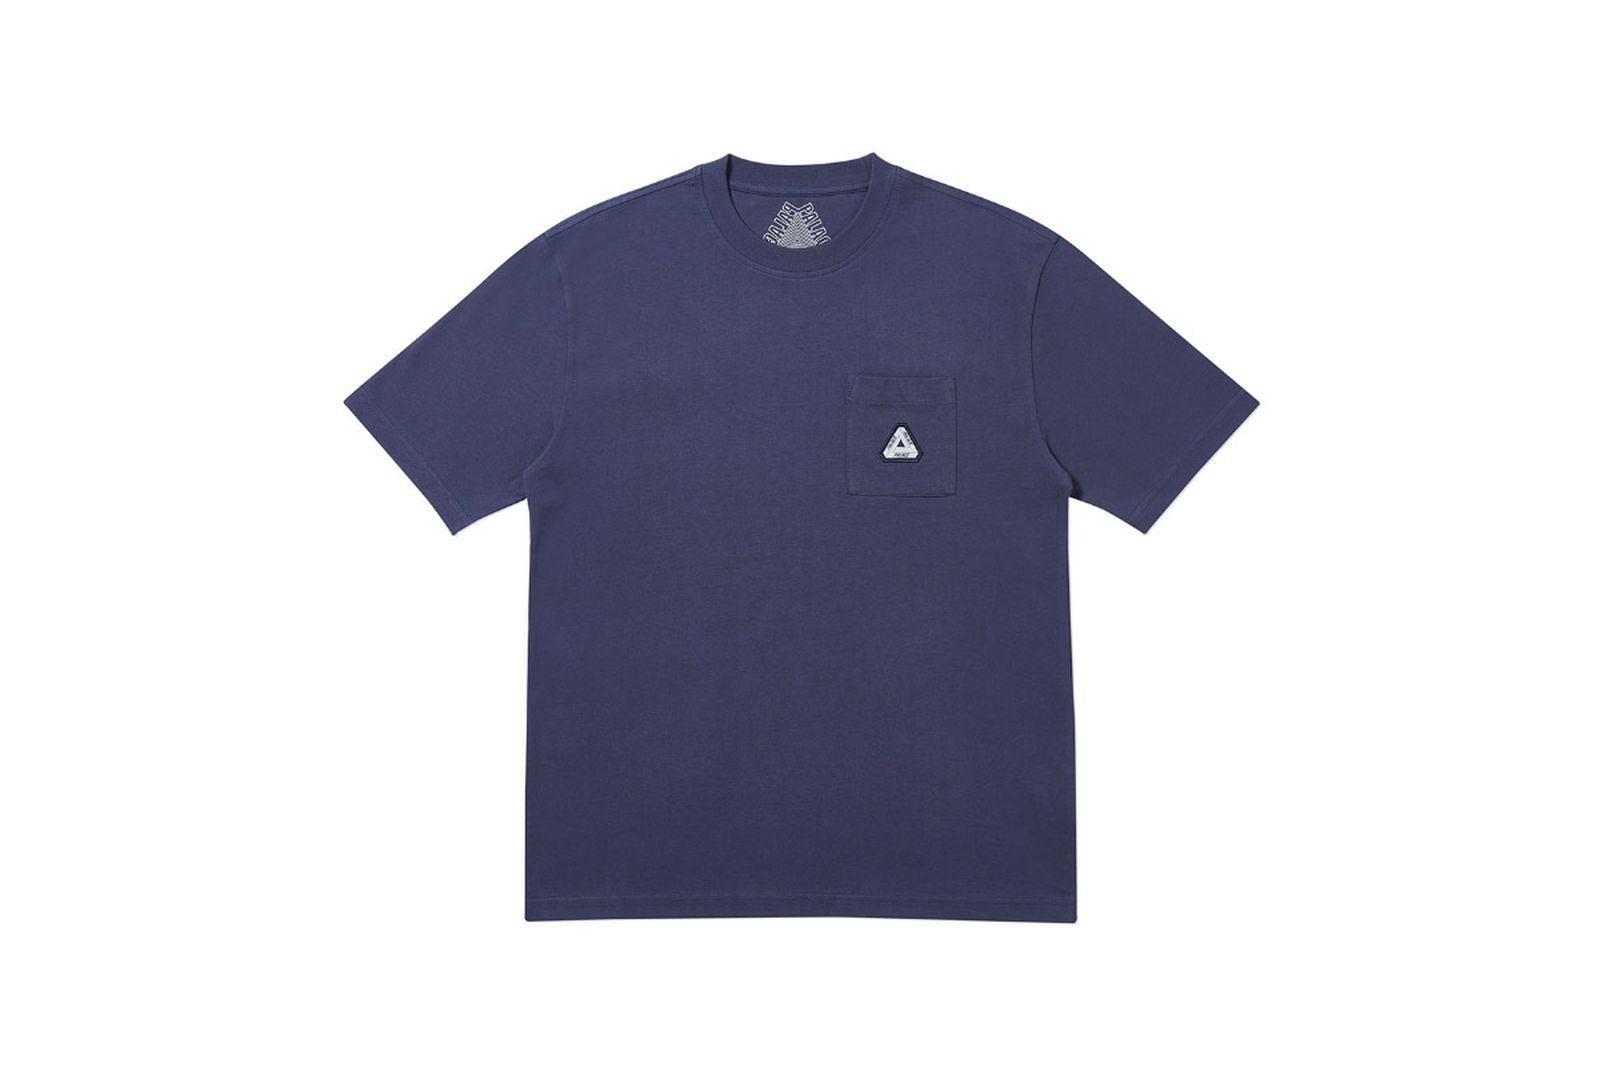 Palace 2019 Autumn T Shirt Pocket navy